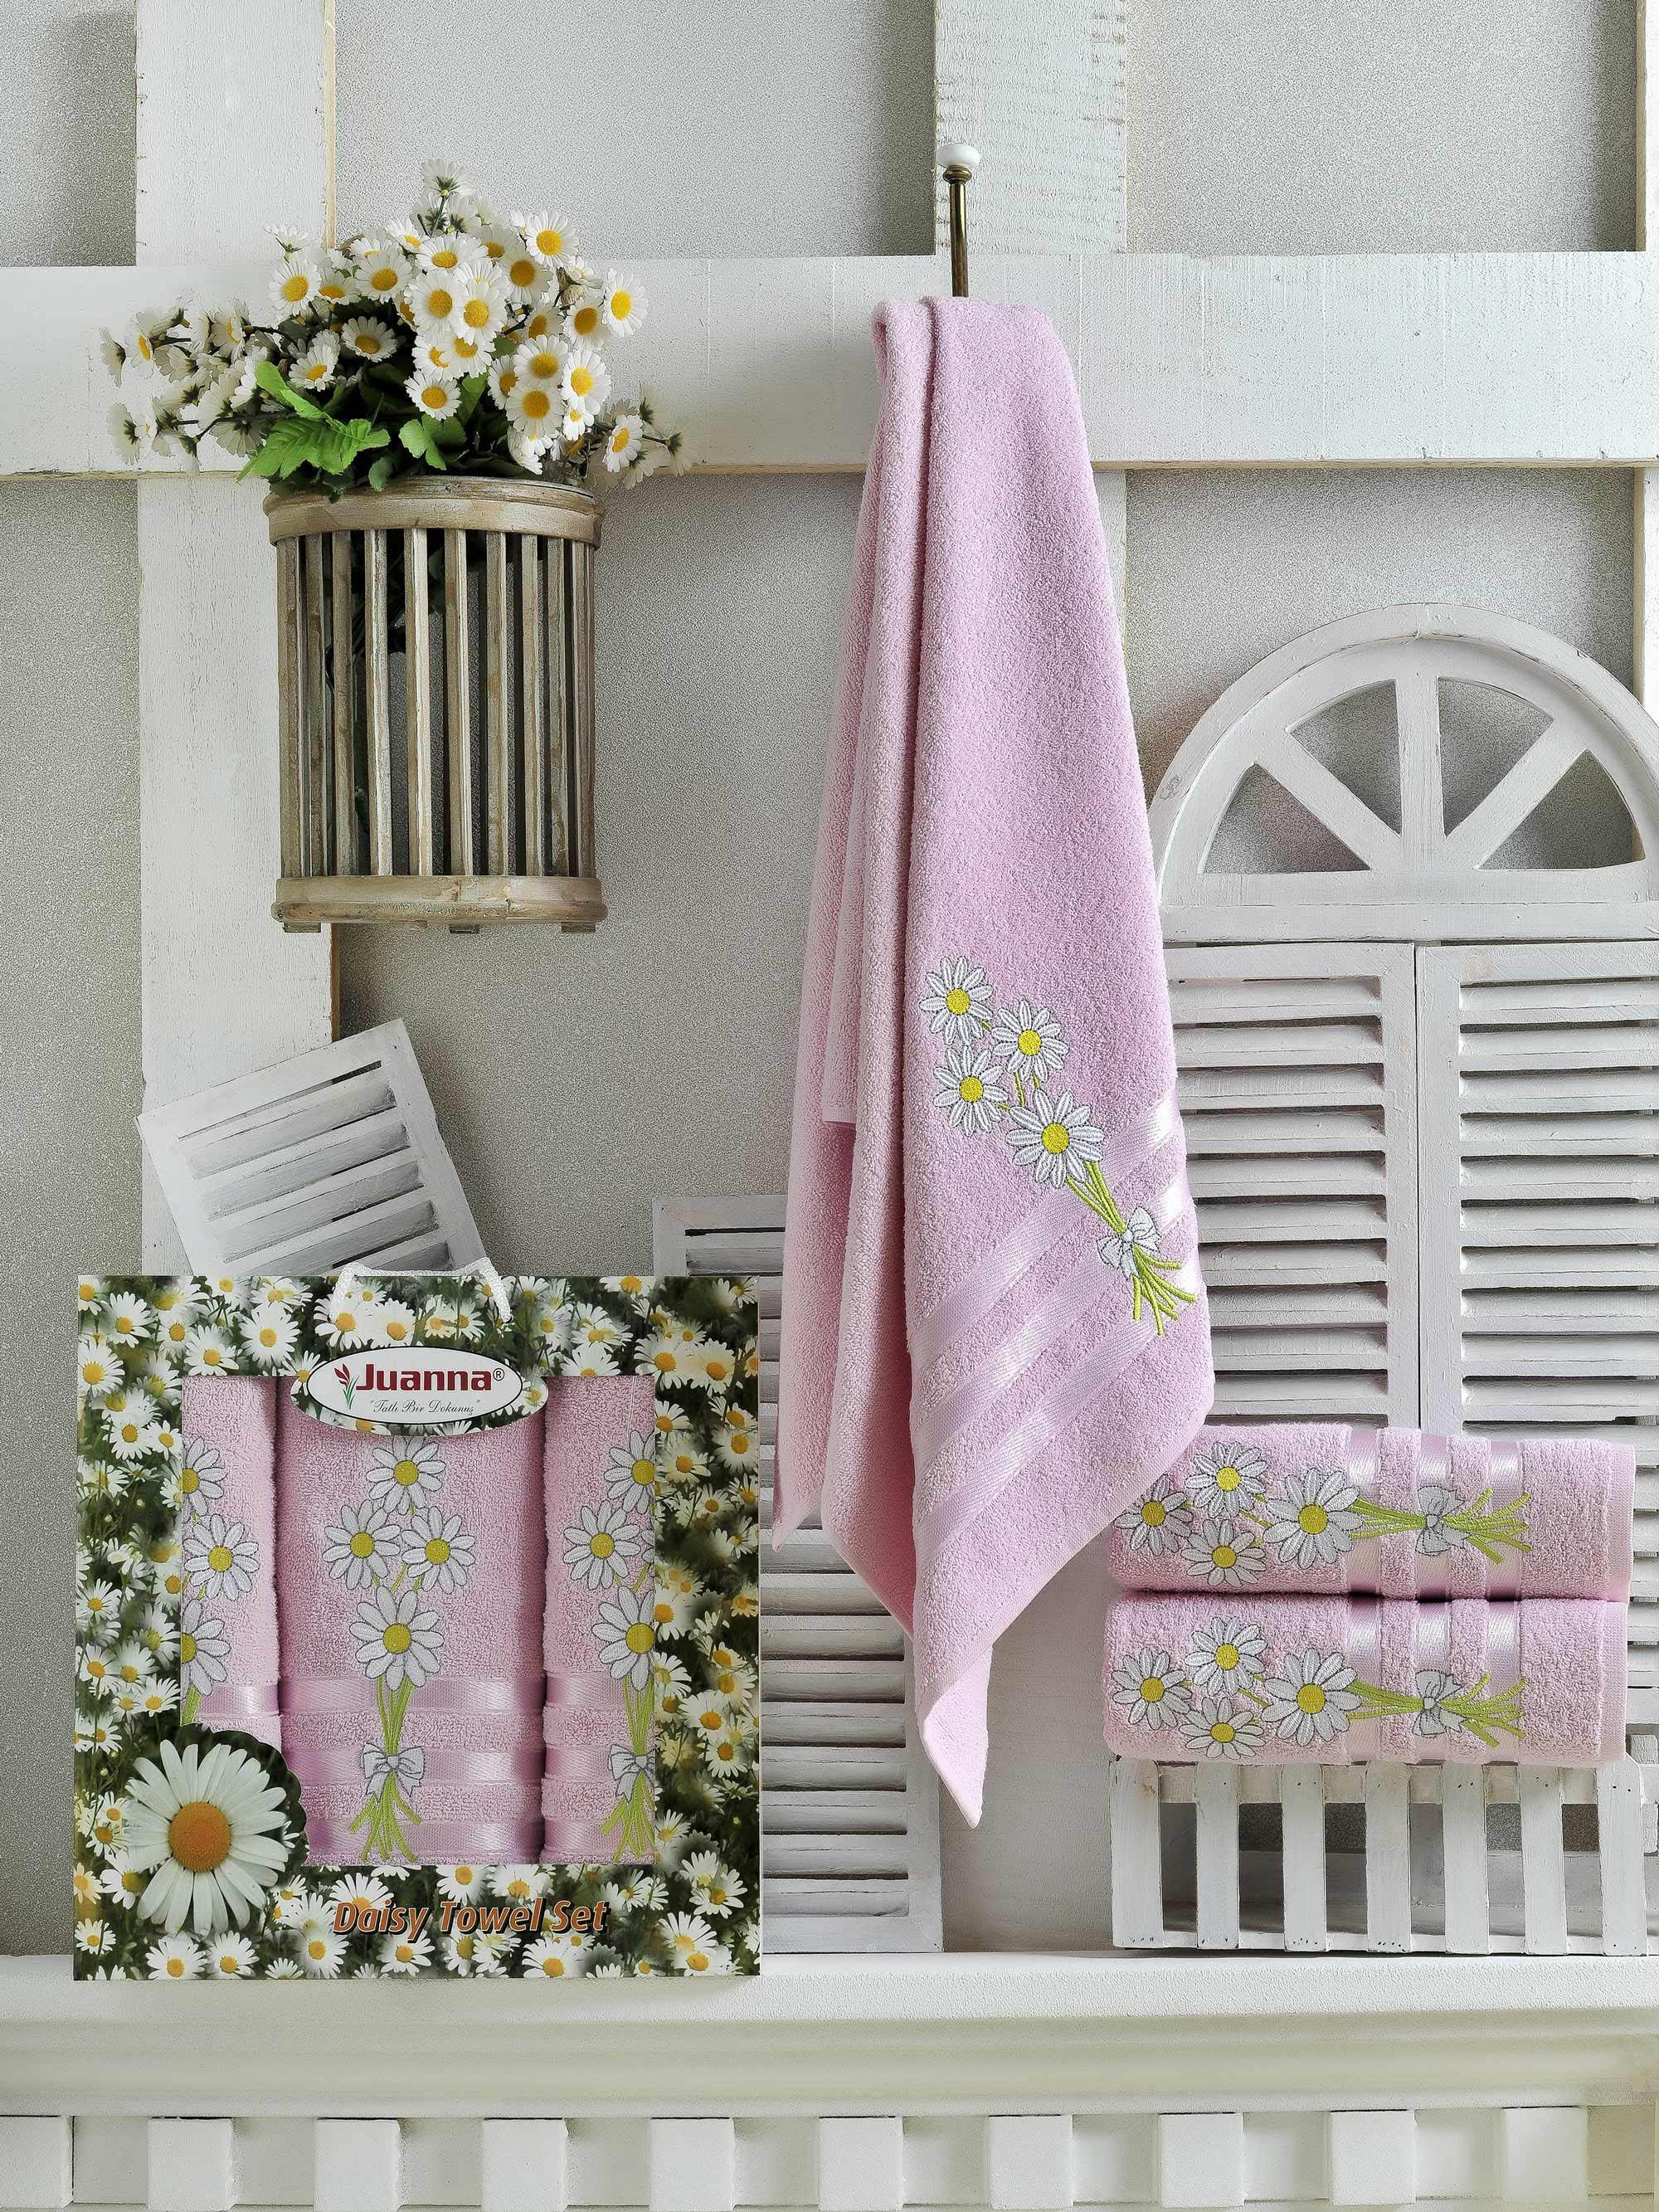 Полотенца Juanna Набор из 3 полотенец Papatya Цвет: Розовый набор из 3 полотенец merzuka sakura 50х90 2 70х140 8432 терракотовый